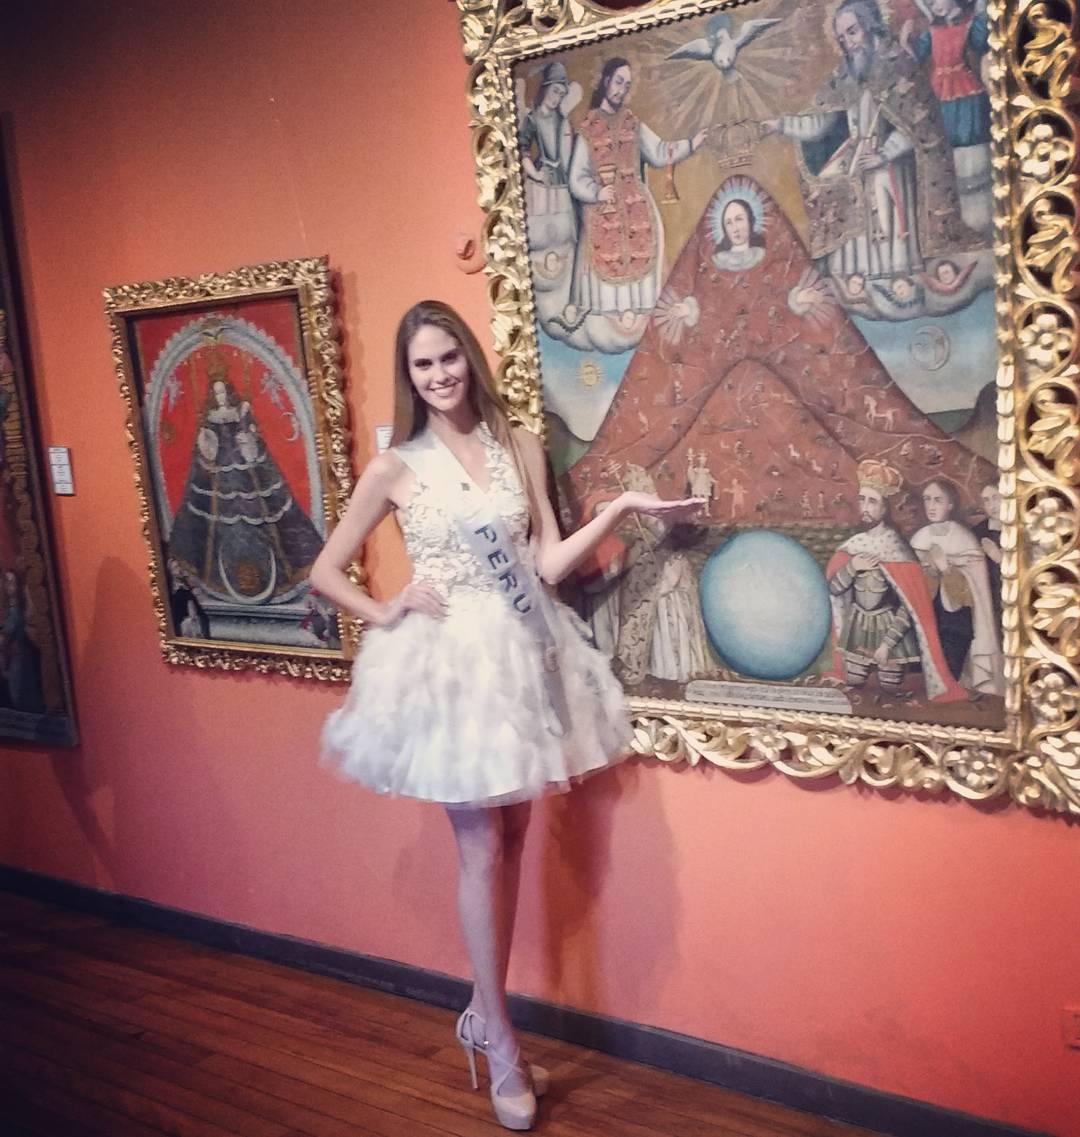 fiorella peirano, 6ta finalista de reyna hispanoamericana 2016/miss peru international 2016. - Página 3 Glfe4rho